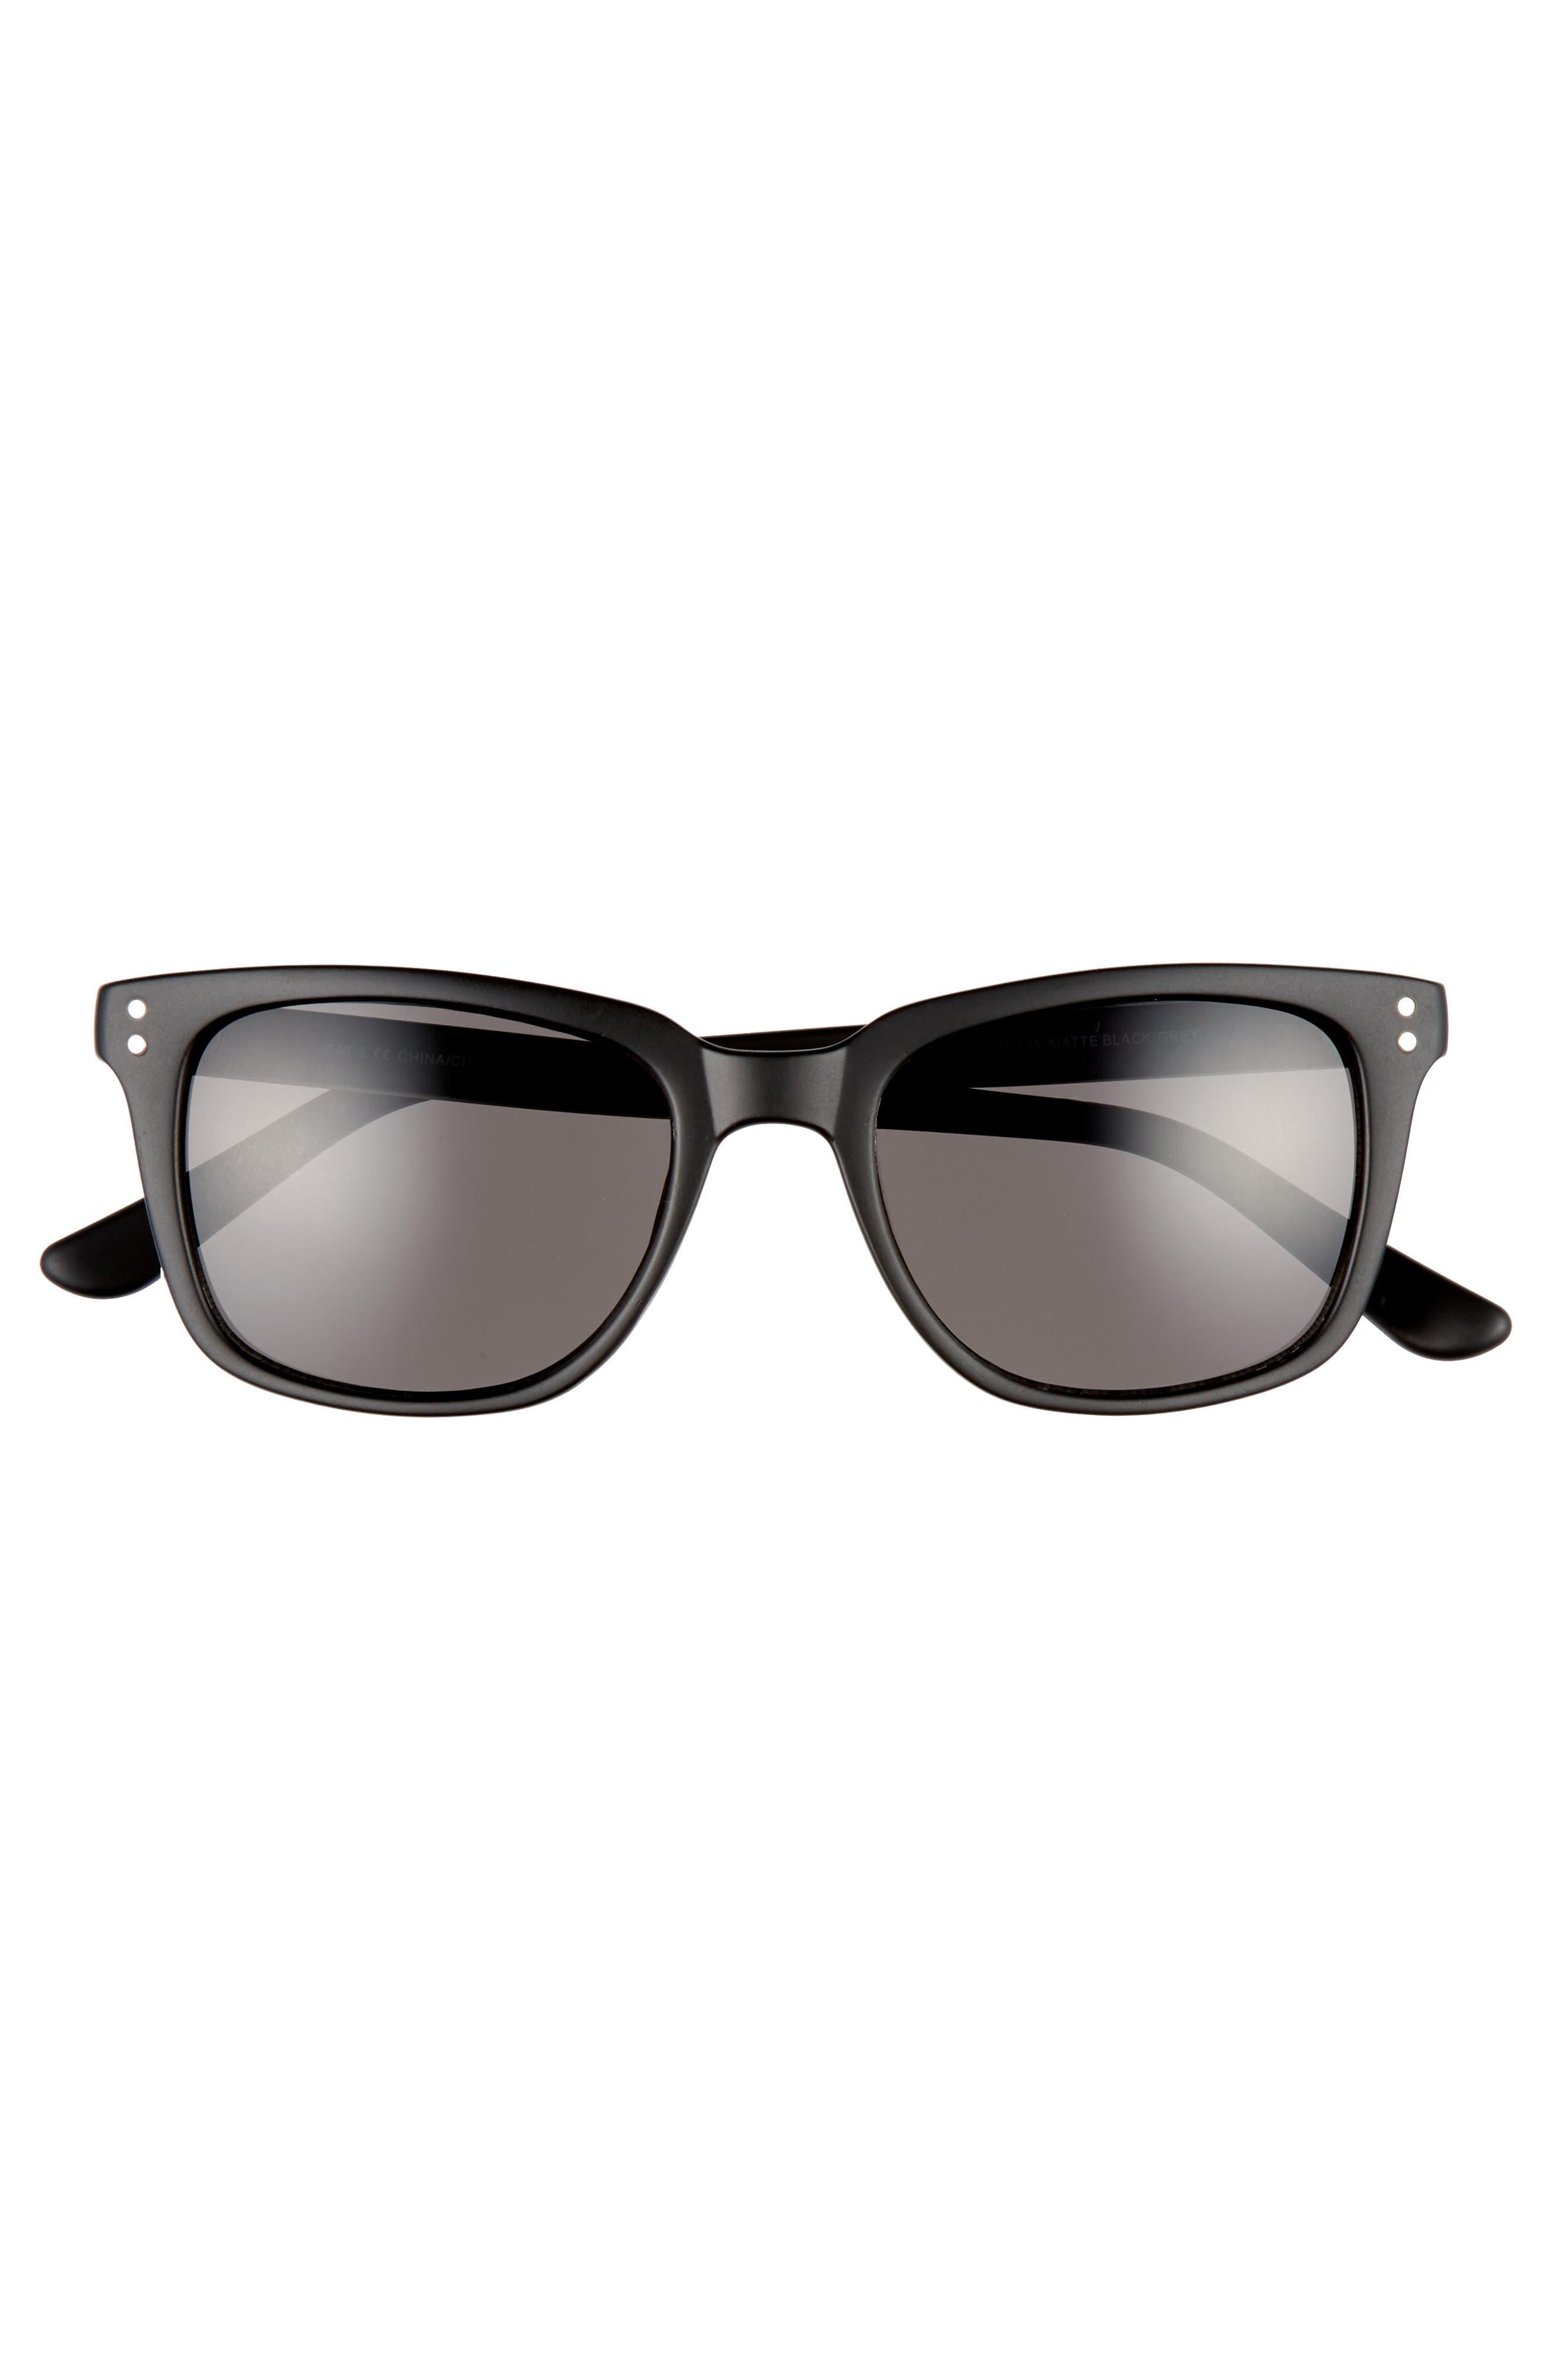 Curtis 52mm Square Sunglasses,                             Alternate thumbnail 2, color,                             MATTE BLACK/ GREY